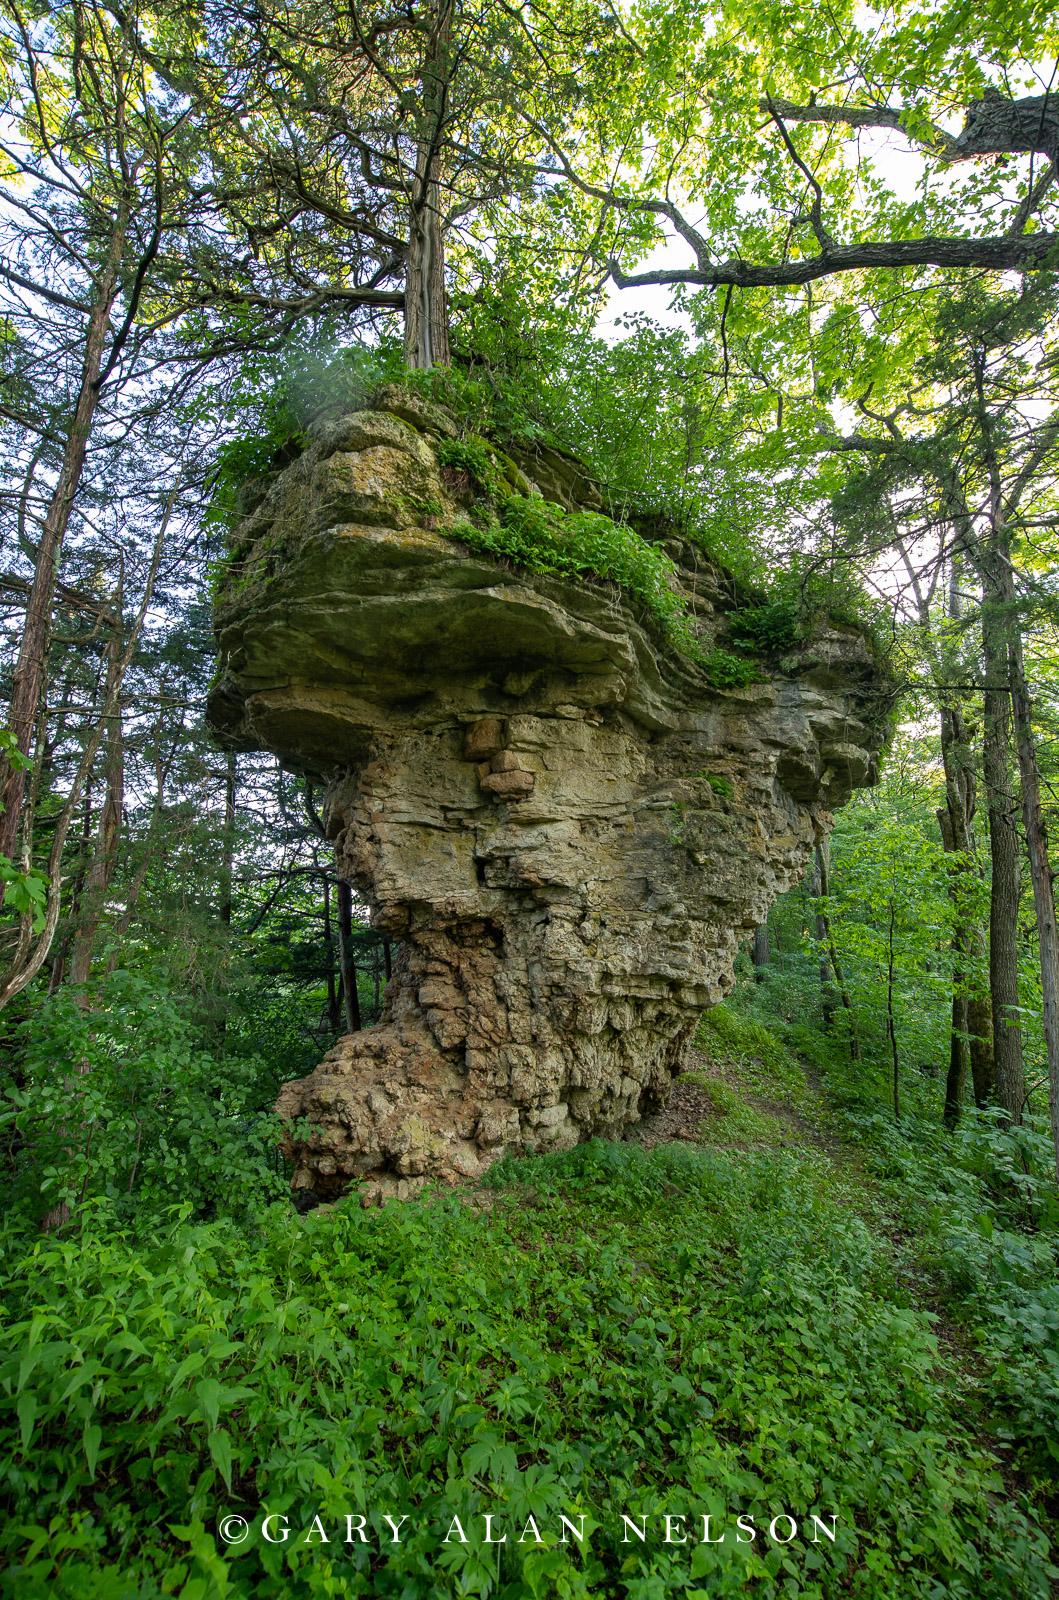 Cabbage Rocks, Richard J. Dorer Memorial Hardwood State Forest, Minnesota